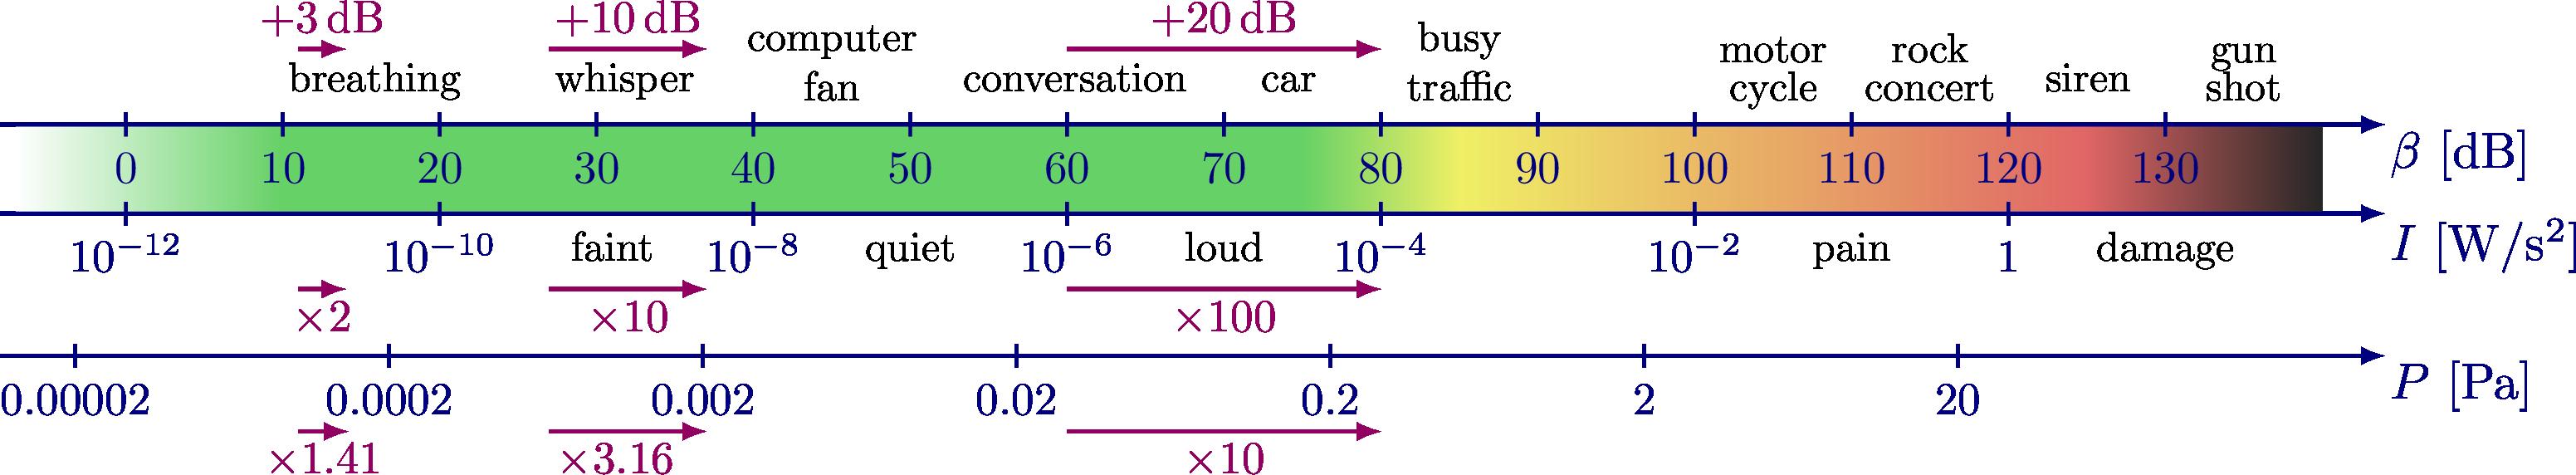 wave_decibel_scale